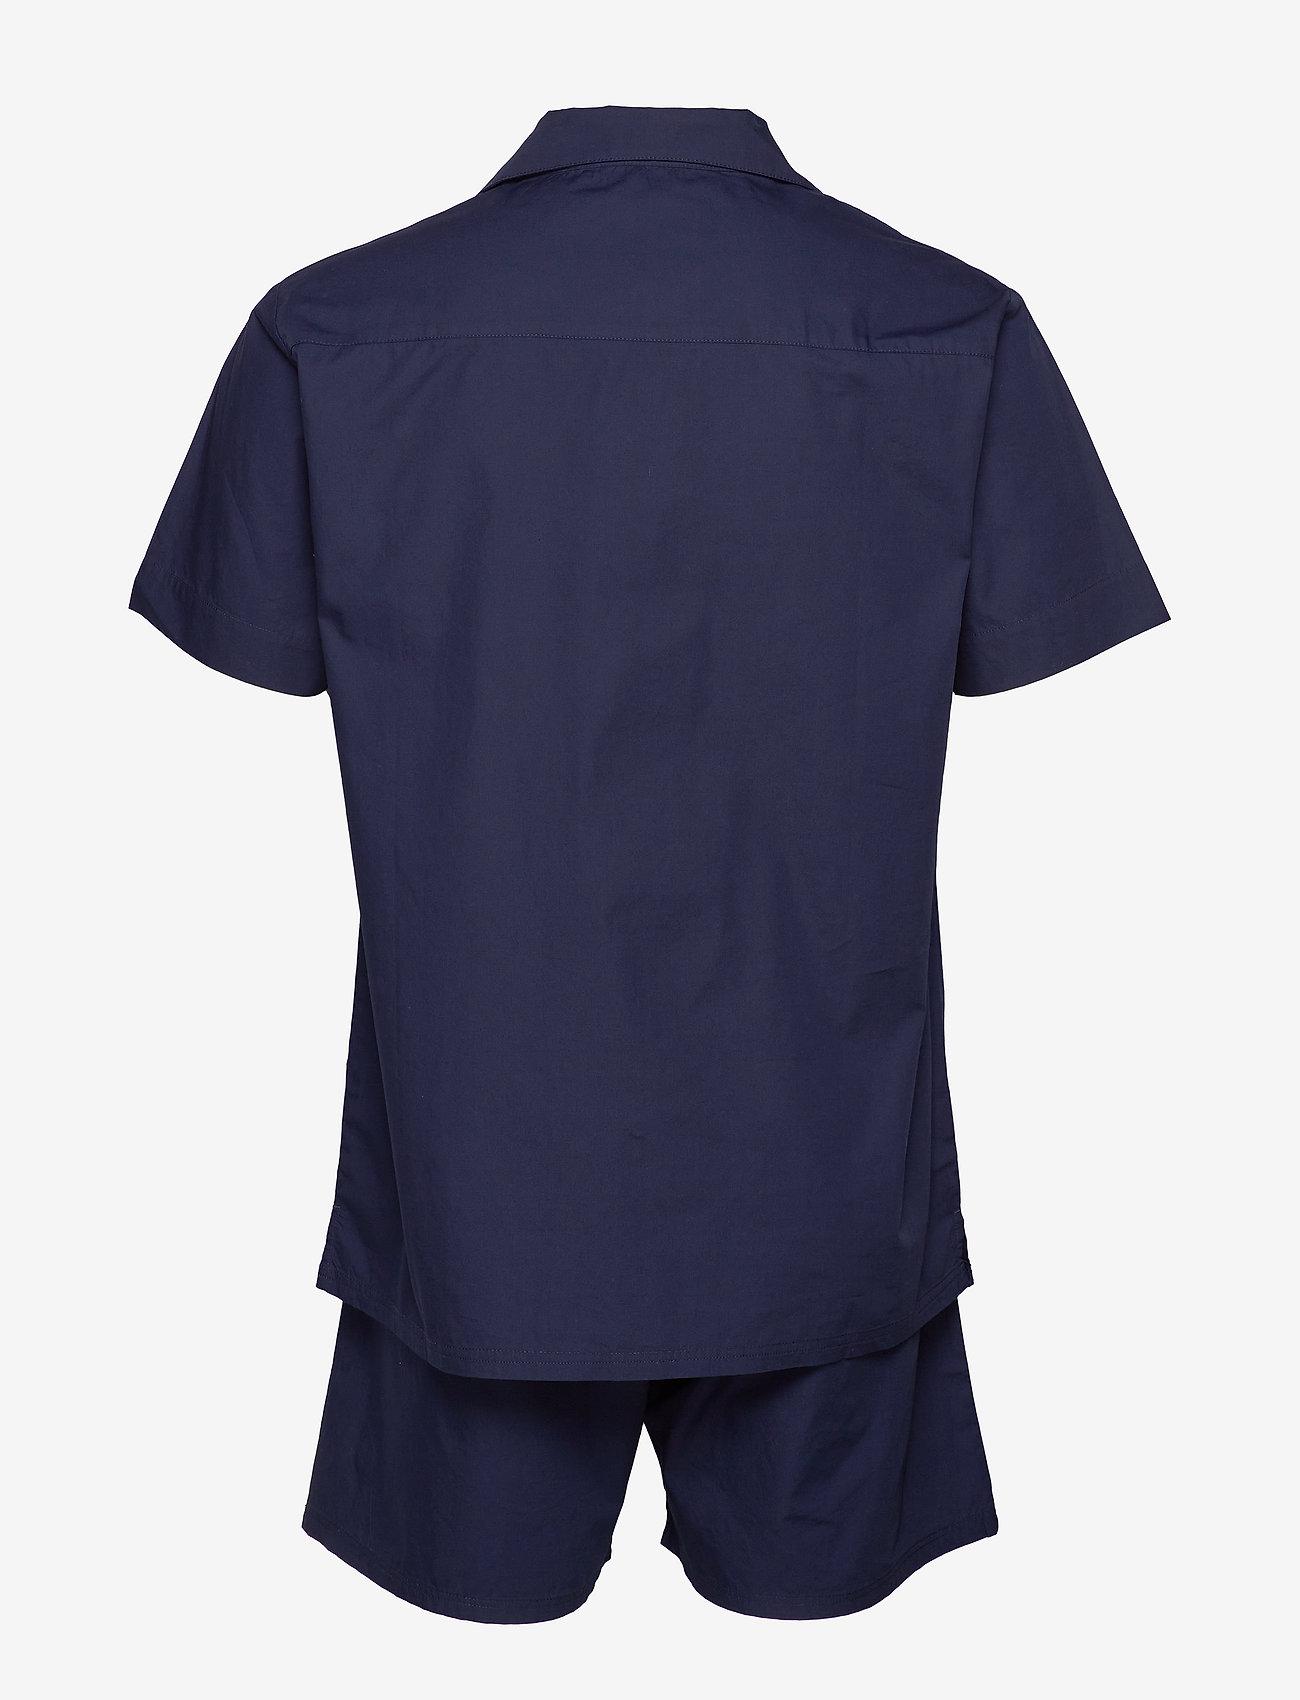 Lyle & Scott - RILEY - pyjamas - peacoat - 1